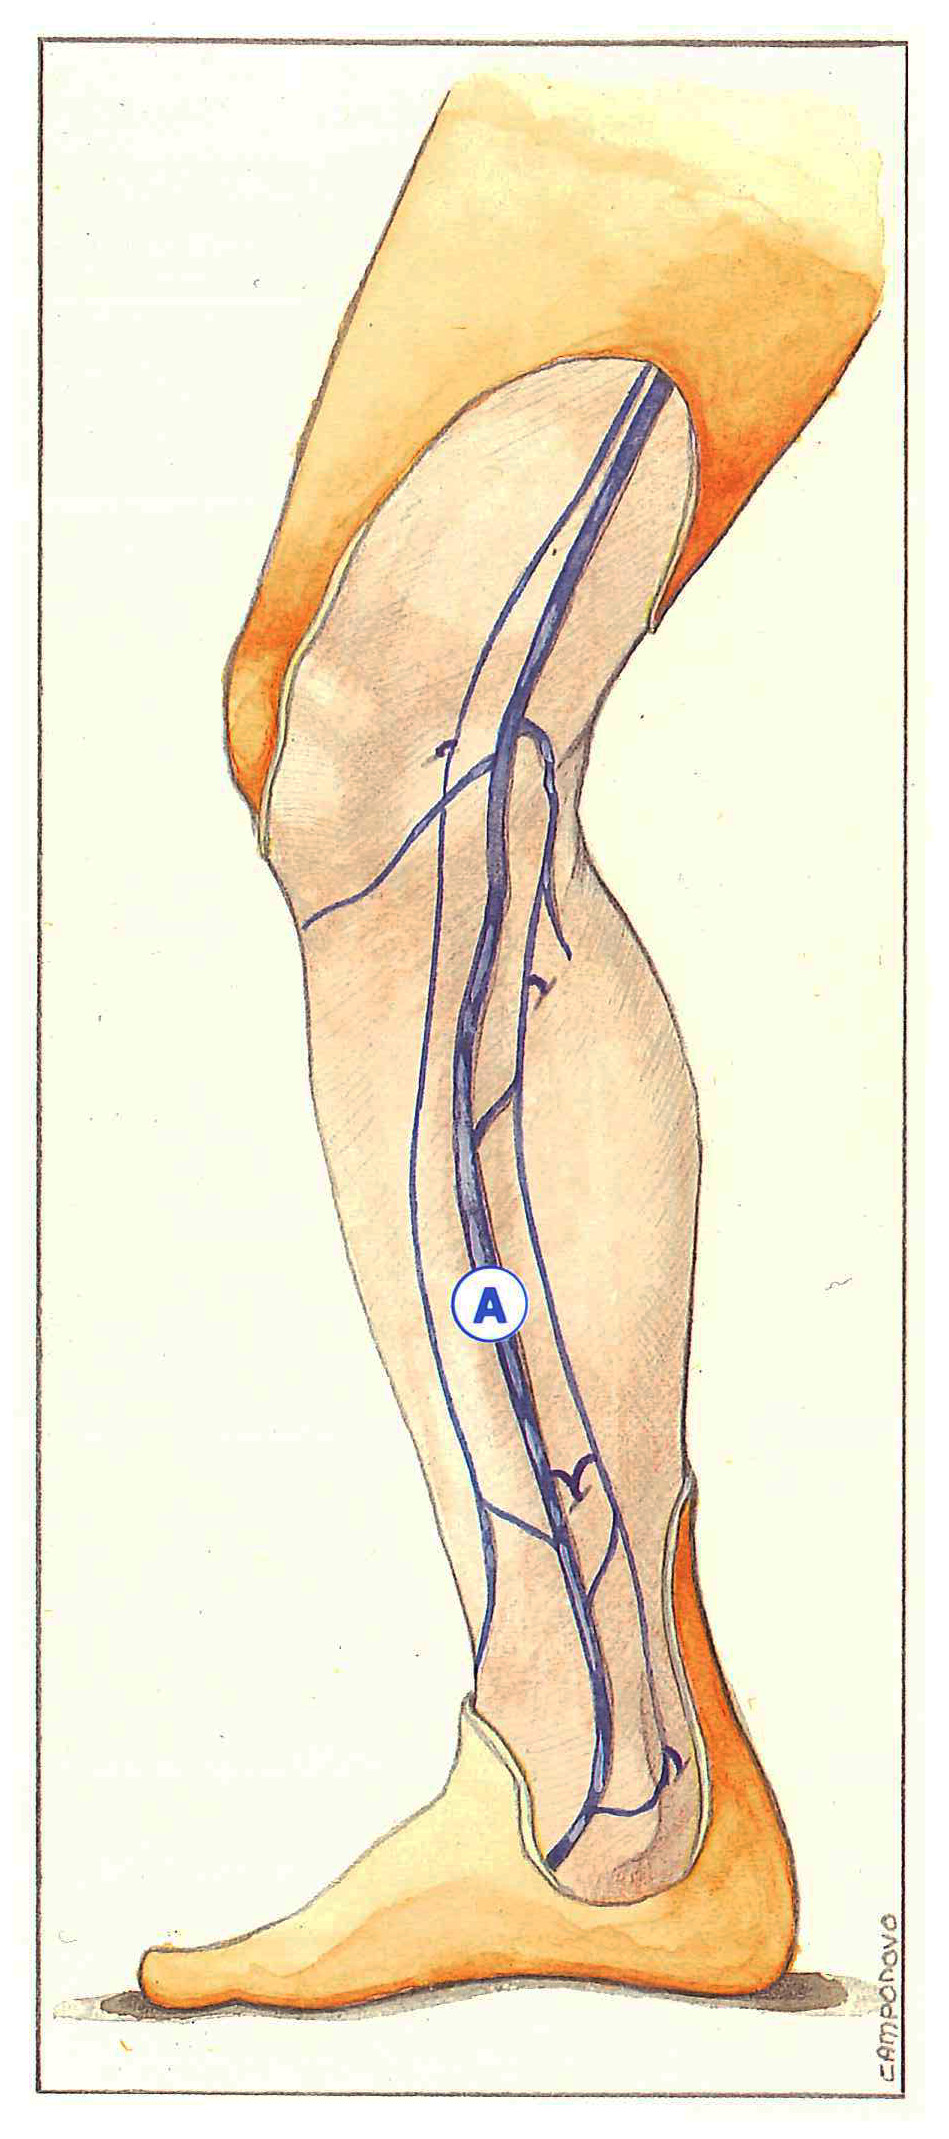 Knee and leg - Phlebologia